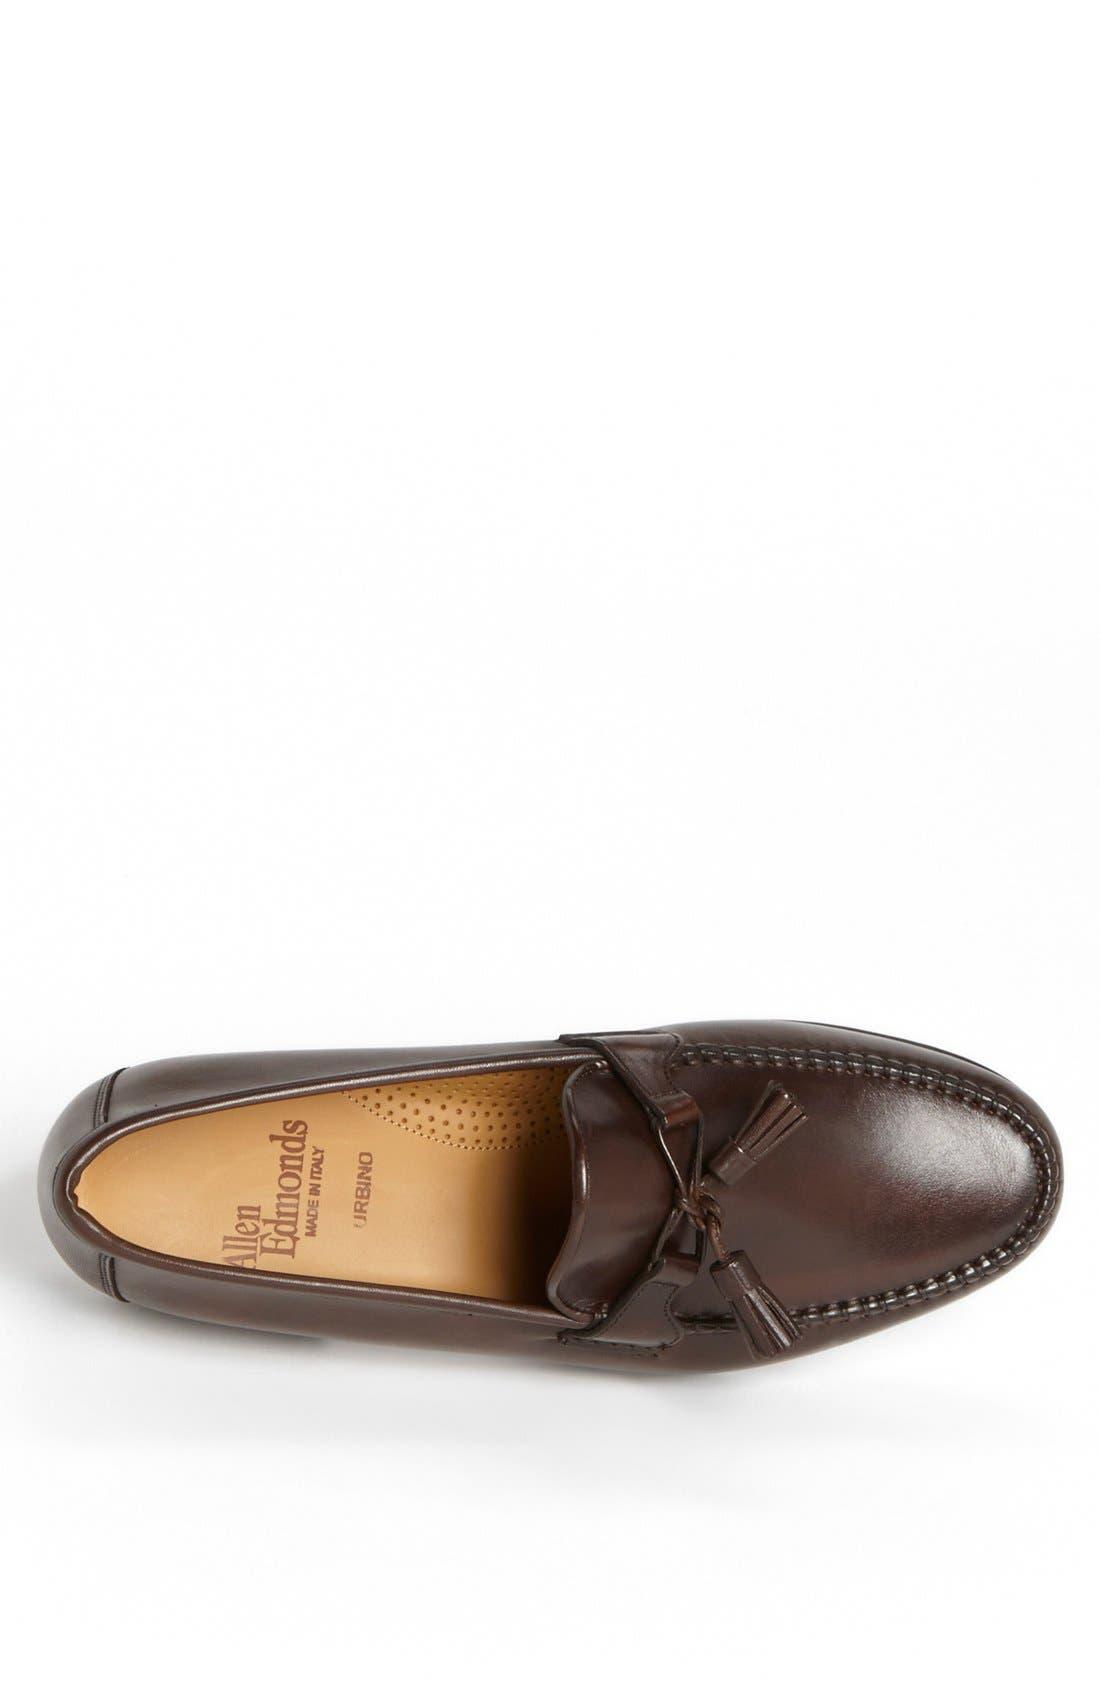 Alternate Image 3  - Allen Edmonds 'Urbino' Tassel Loafer (Men)